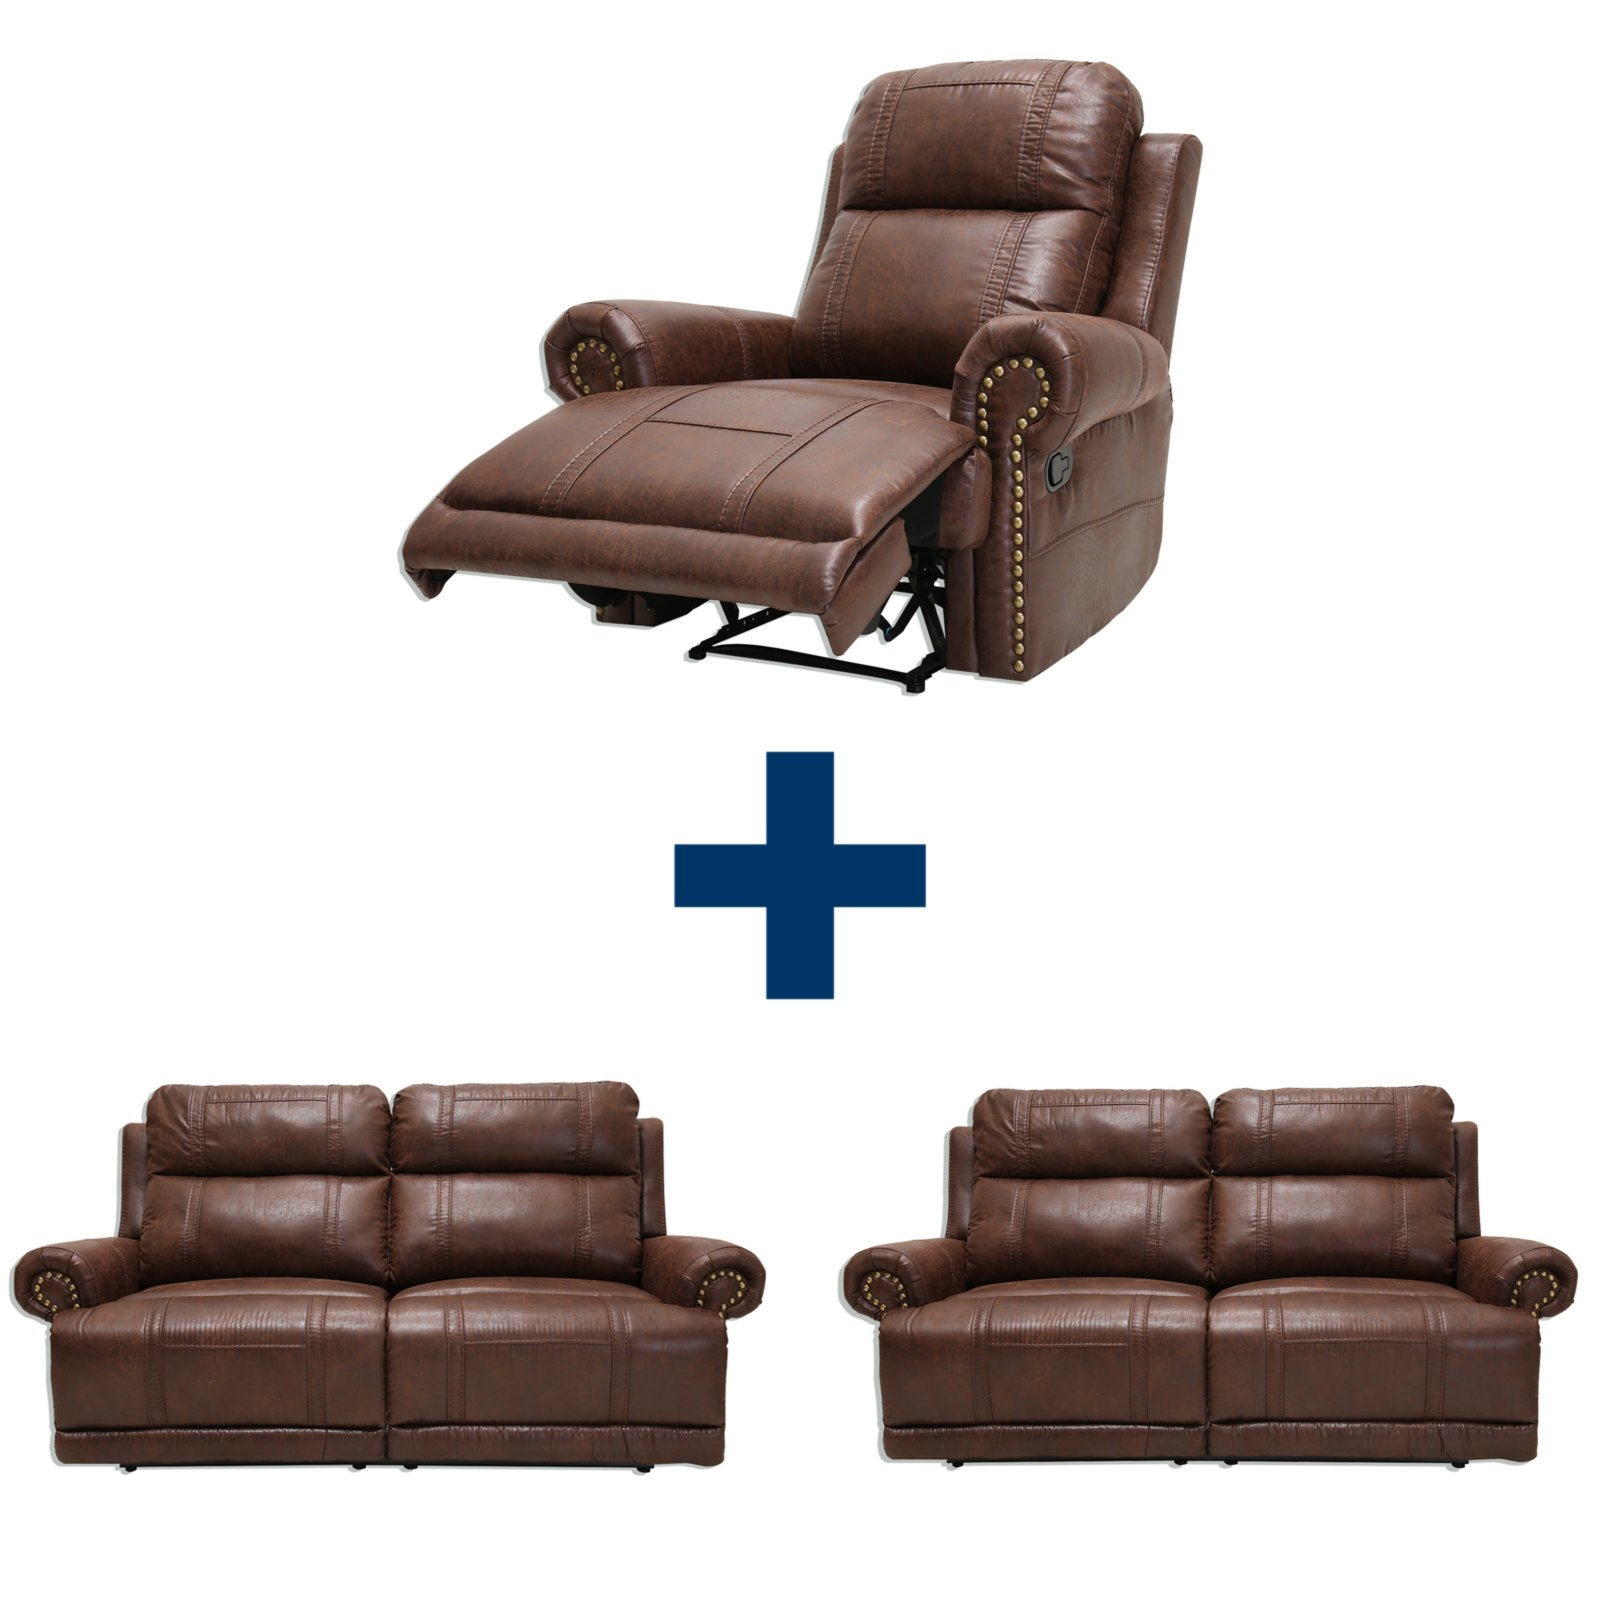 Set CELINA 2 Sofas mit Sessel braun mit Funktion